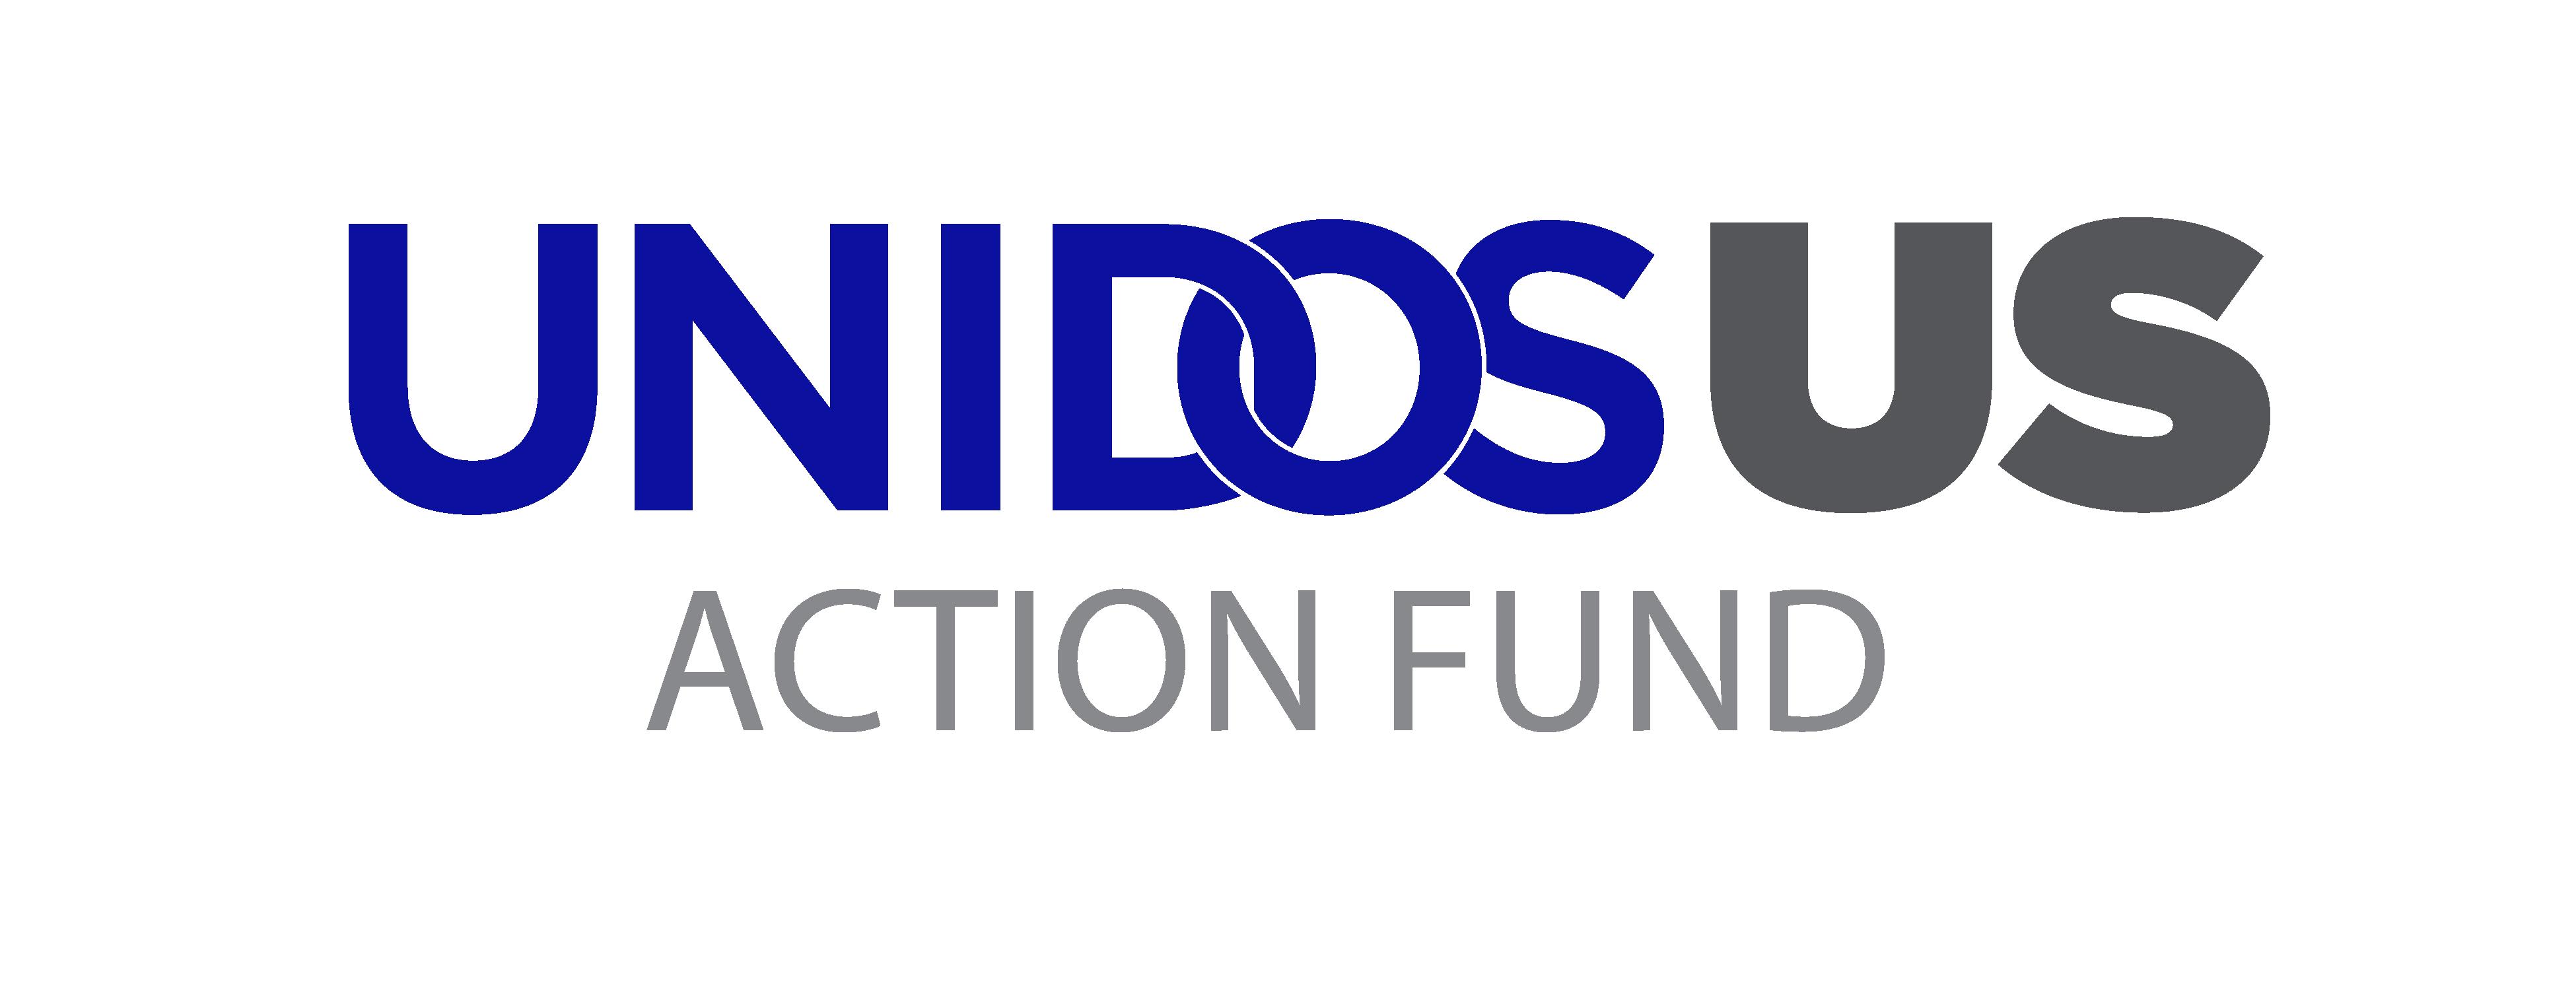 UnidosUS Action Fund